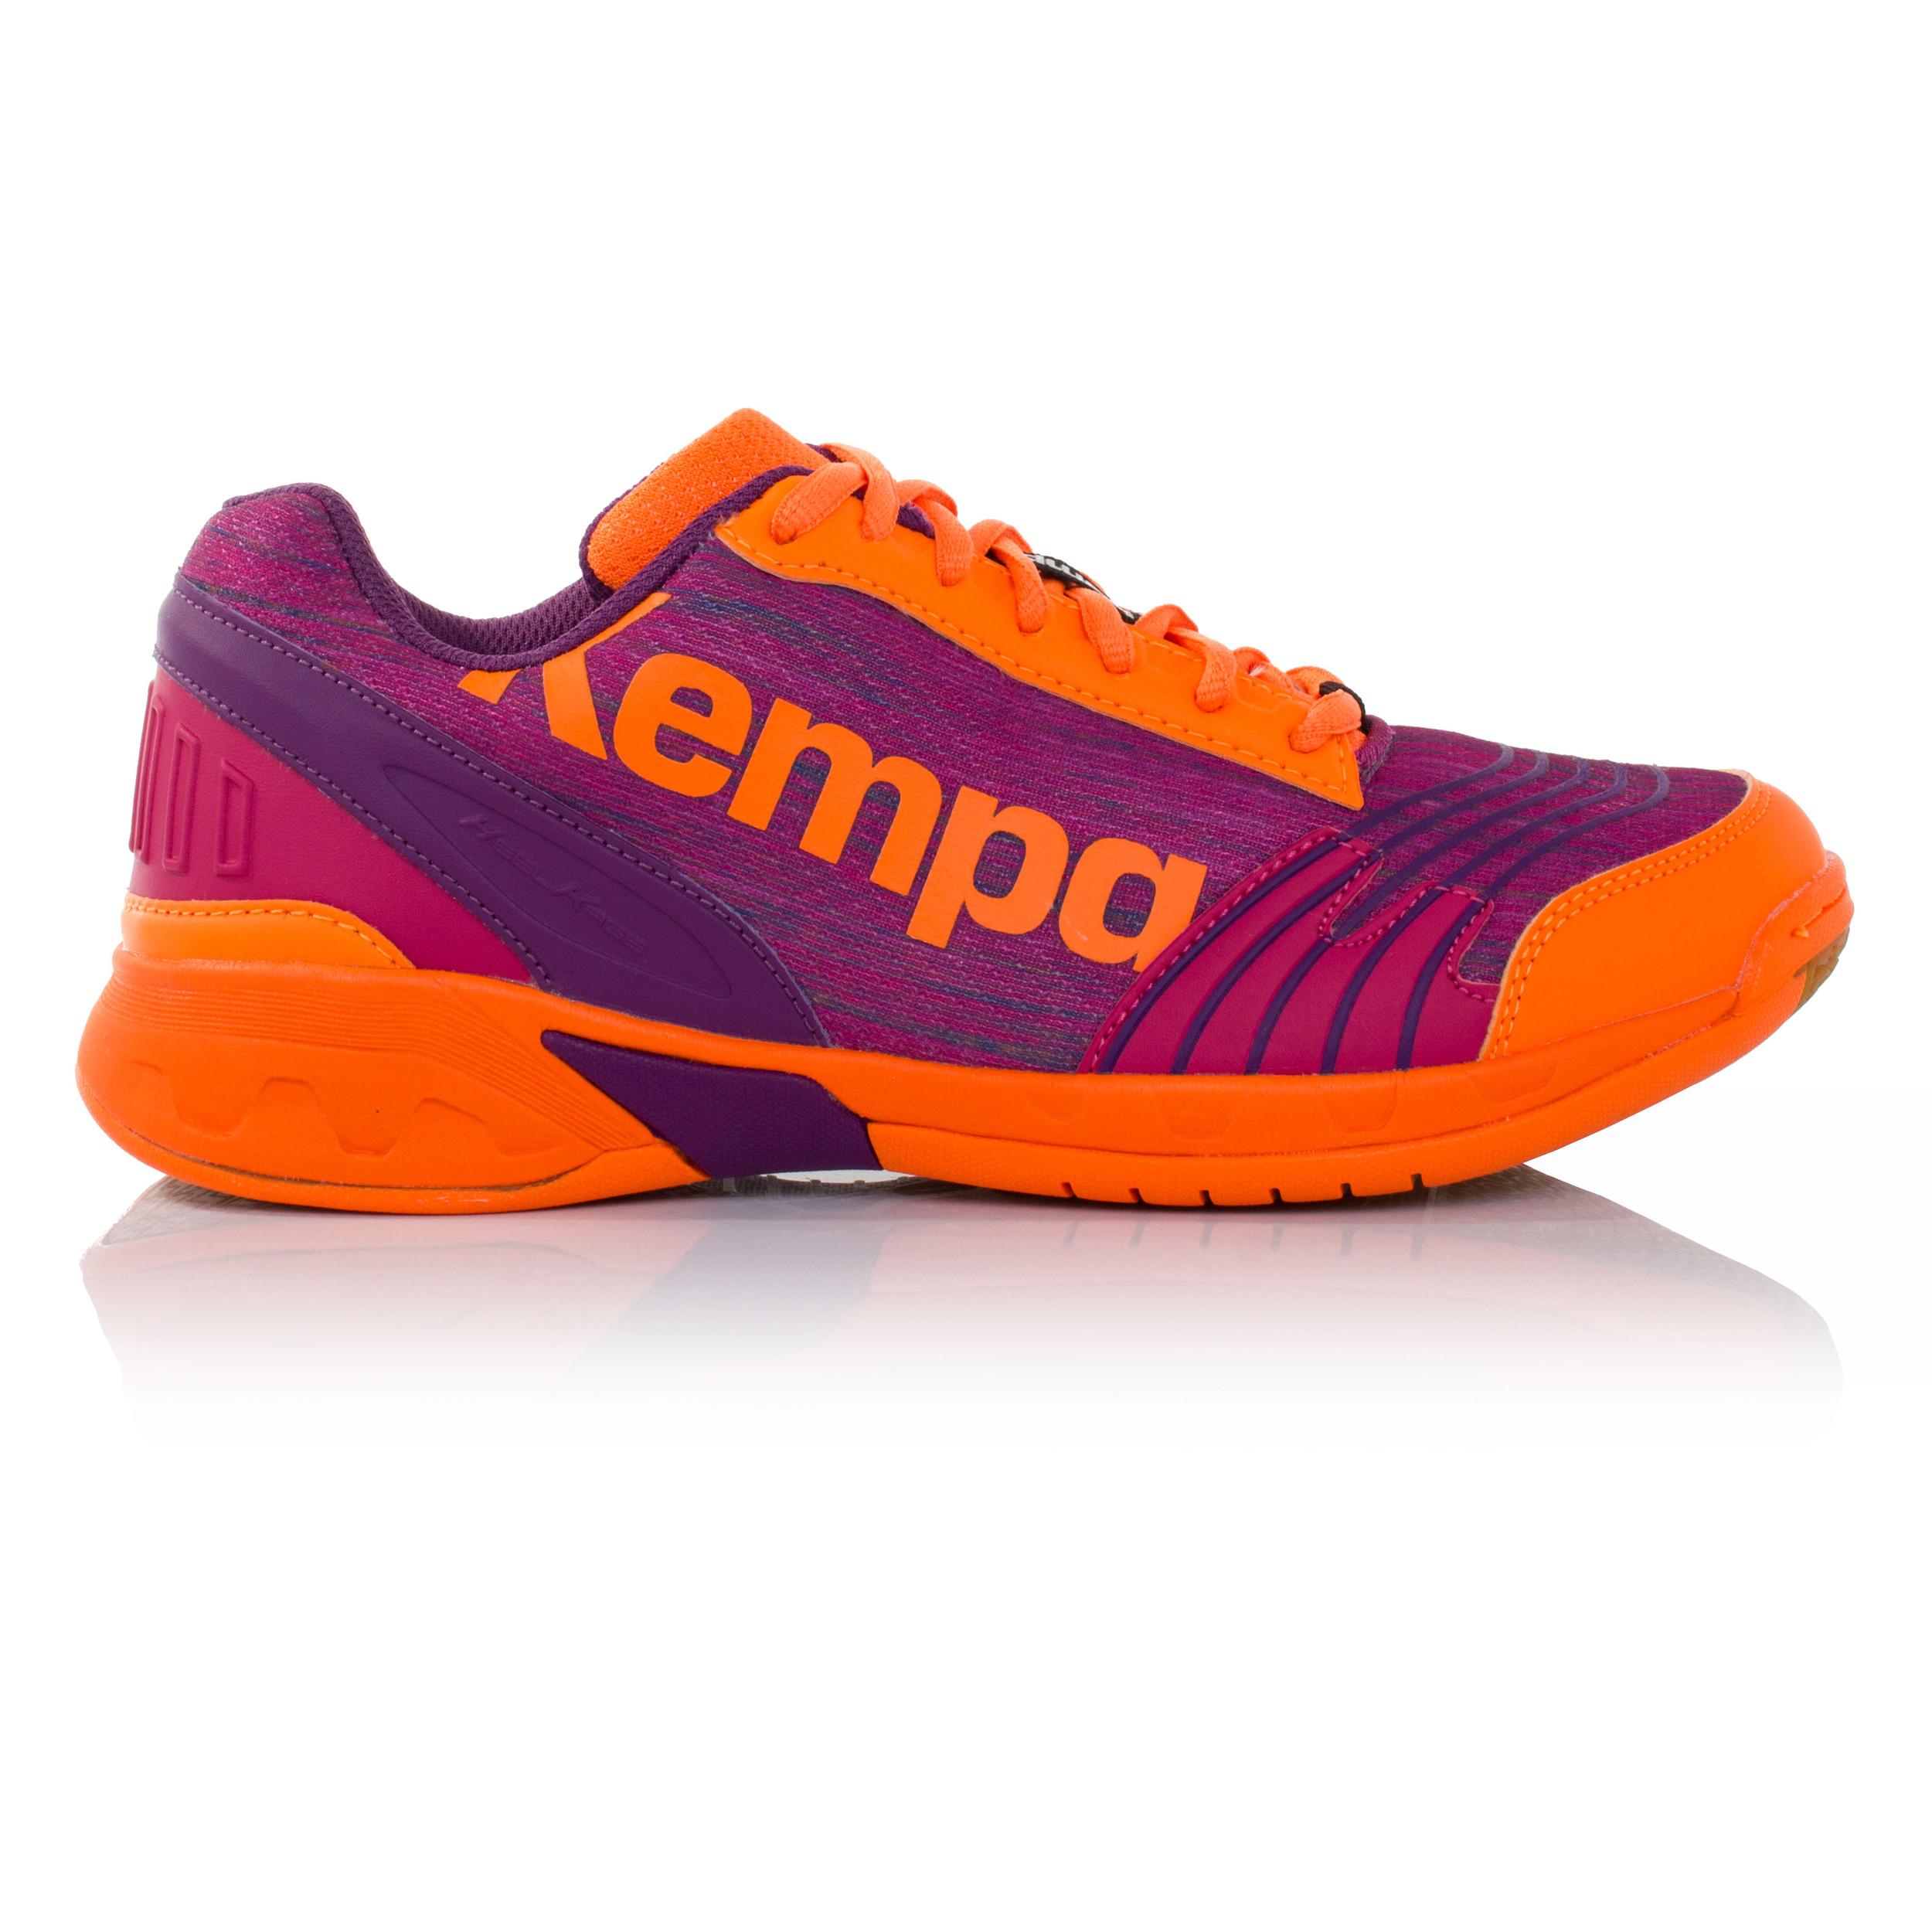 online store dde70 35802 Kempa Attack Mujer Naranja Violeta Balonmano Corte Deporte Zapatos  Zapatillas